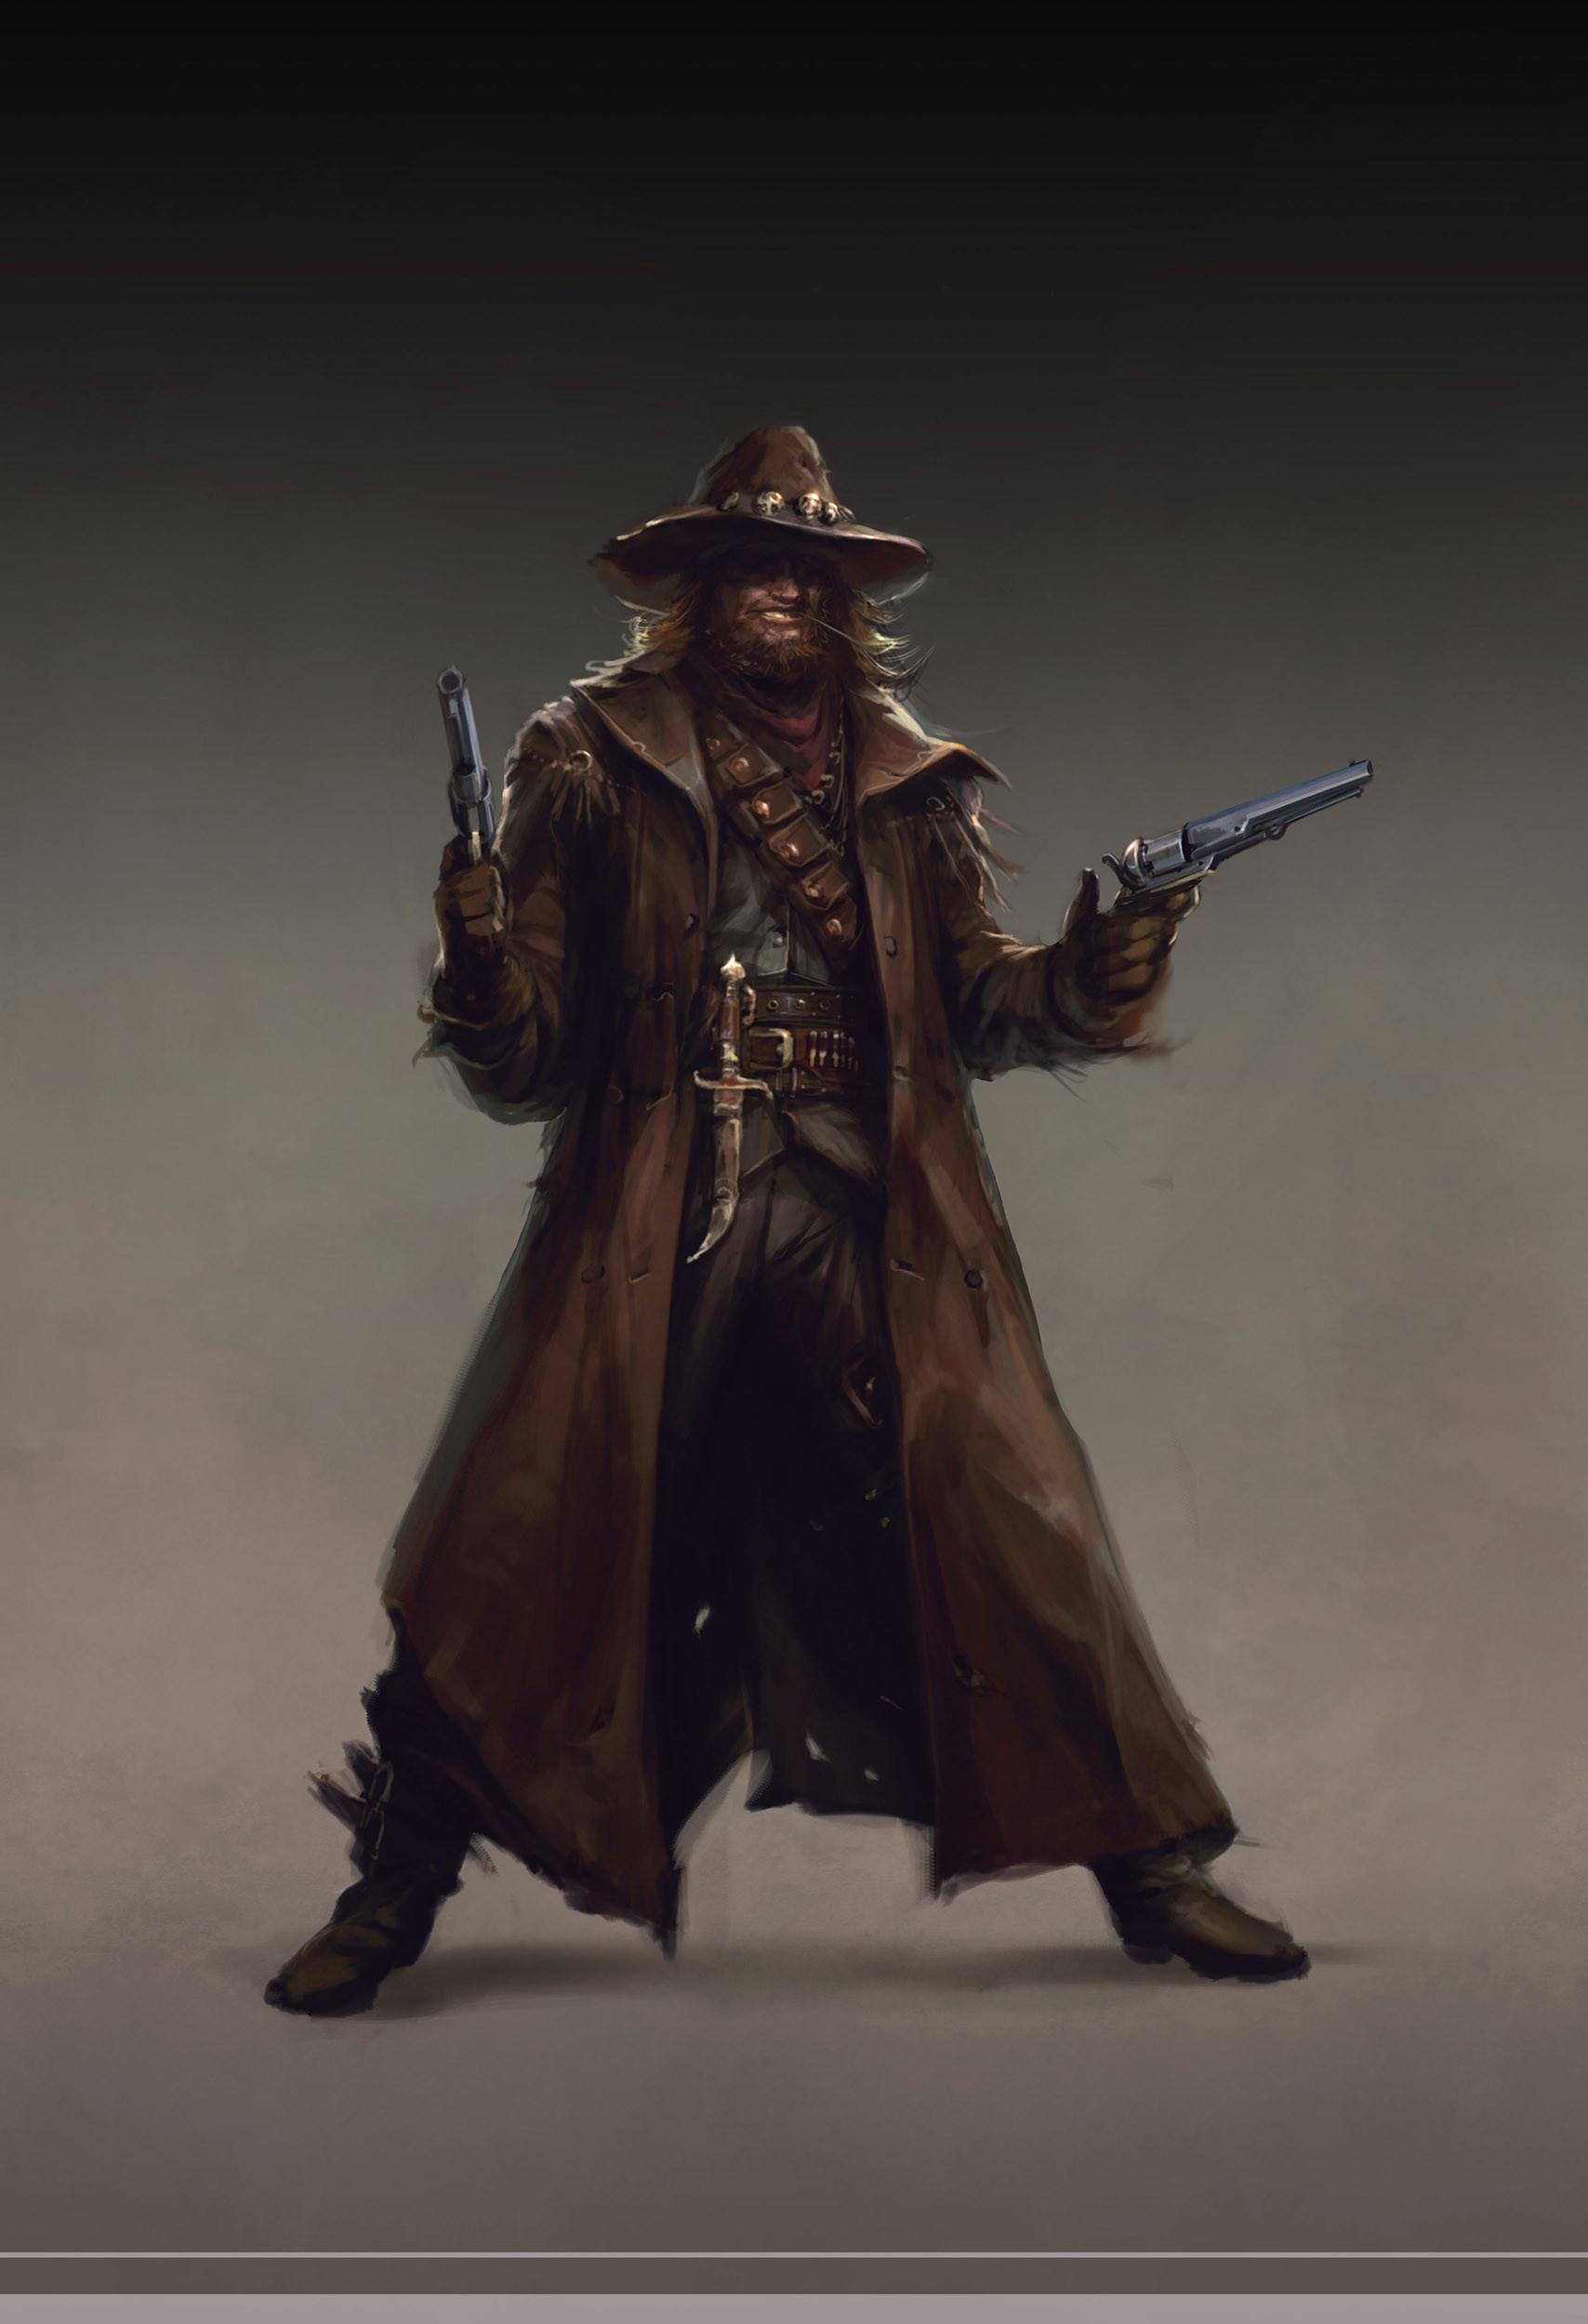 Marco hasmann gunslinger2